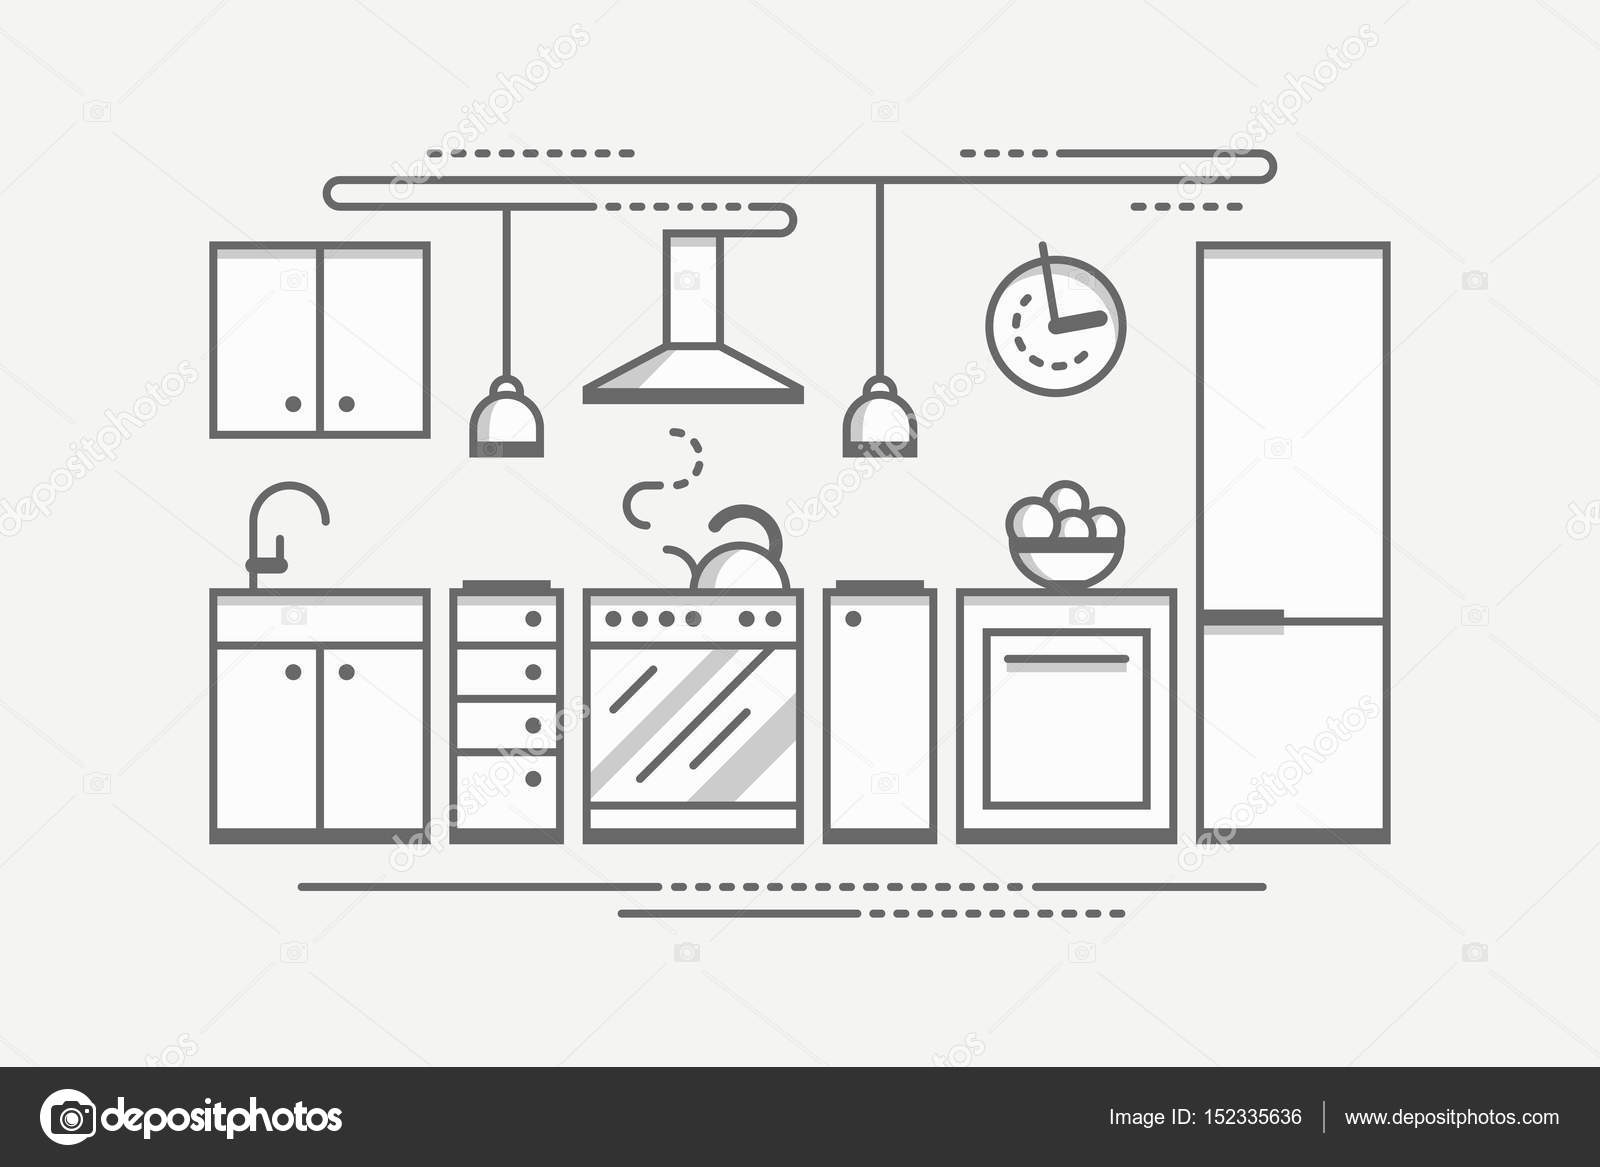 Diseño de interiores de cocina monocromática. Planos estilo Vector ...